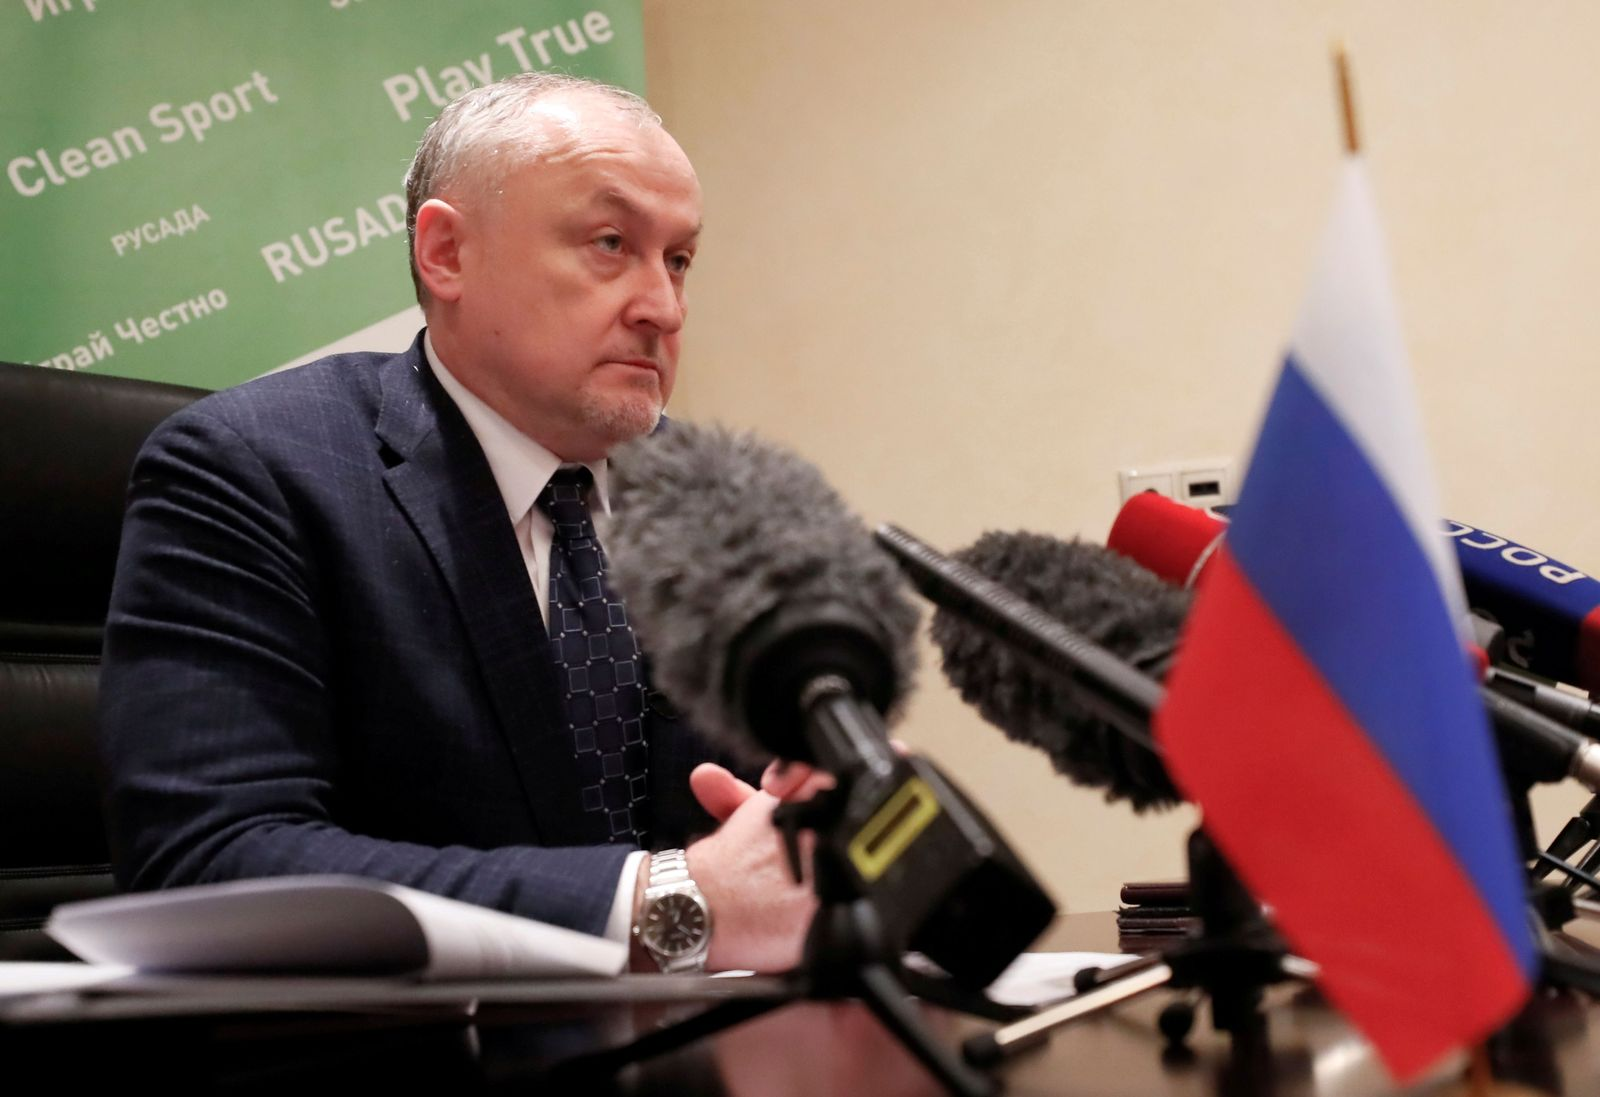 SPORT-DOPING-RUSSIA